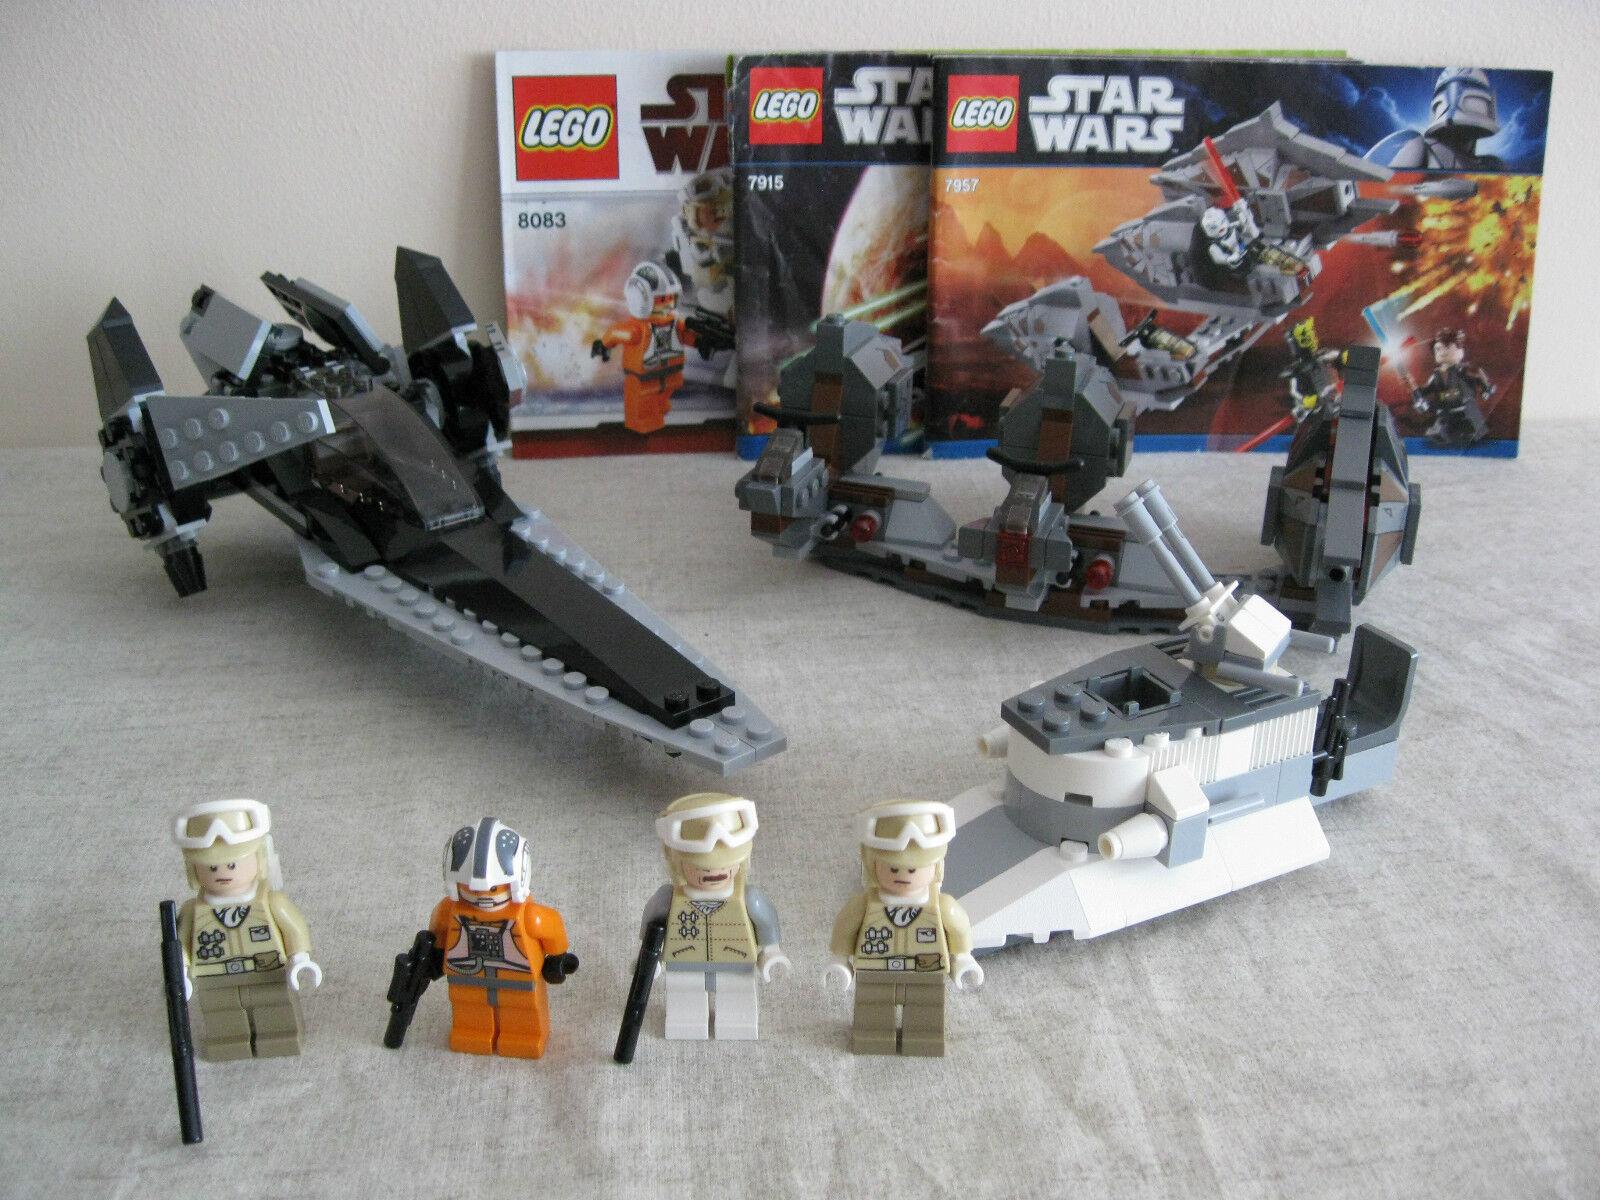 Lego 7915 7957 & 8083 Star Wars Wars Wars Imperial V wing Sith Nightspeeder & Trooper 8aa93f